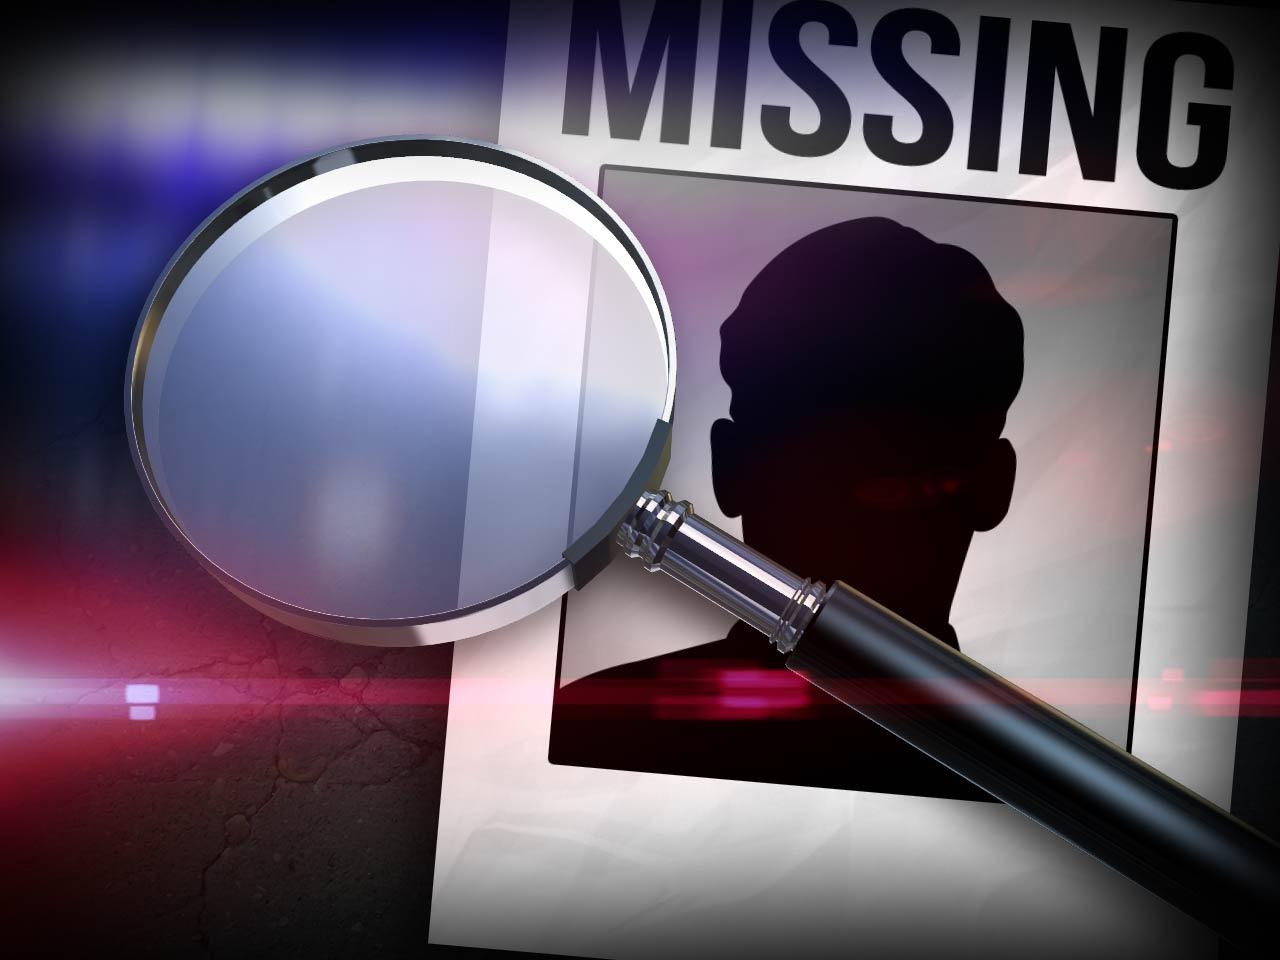 missing man1_1553268388011.jpg.jpg